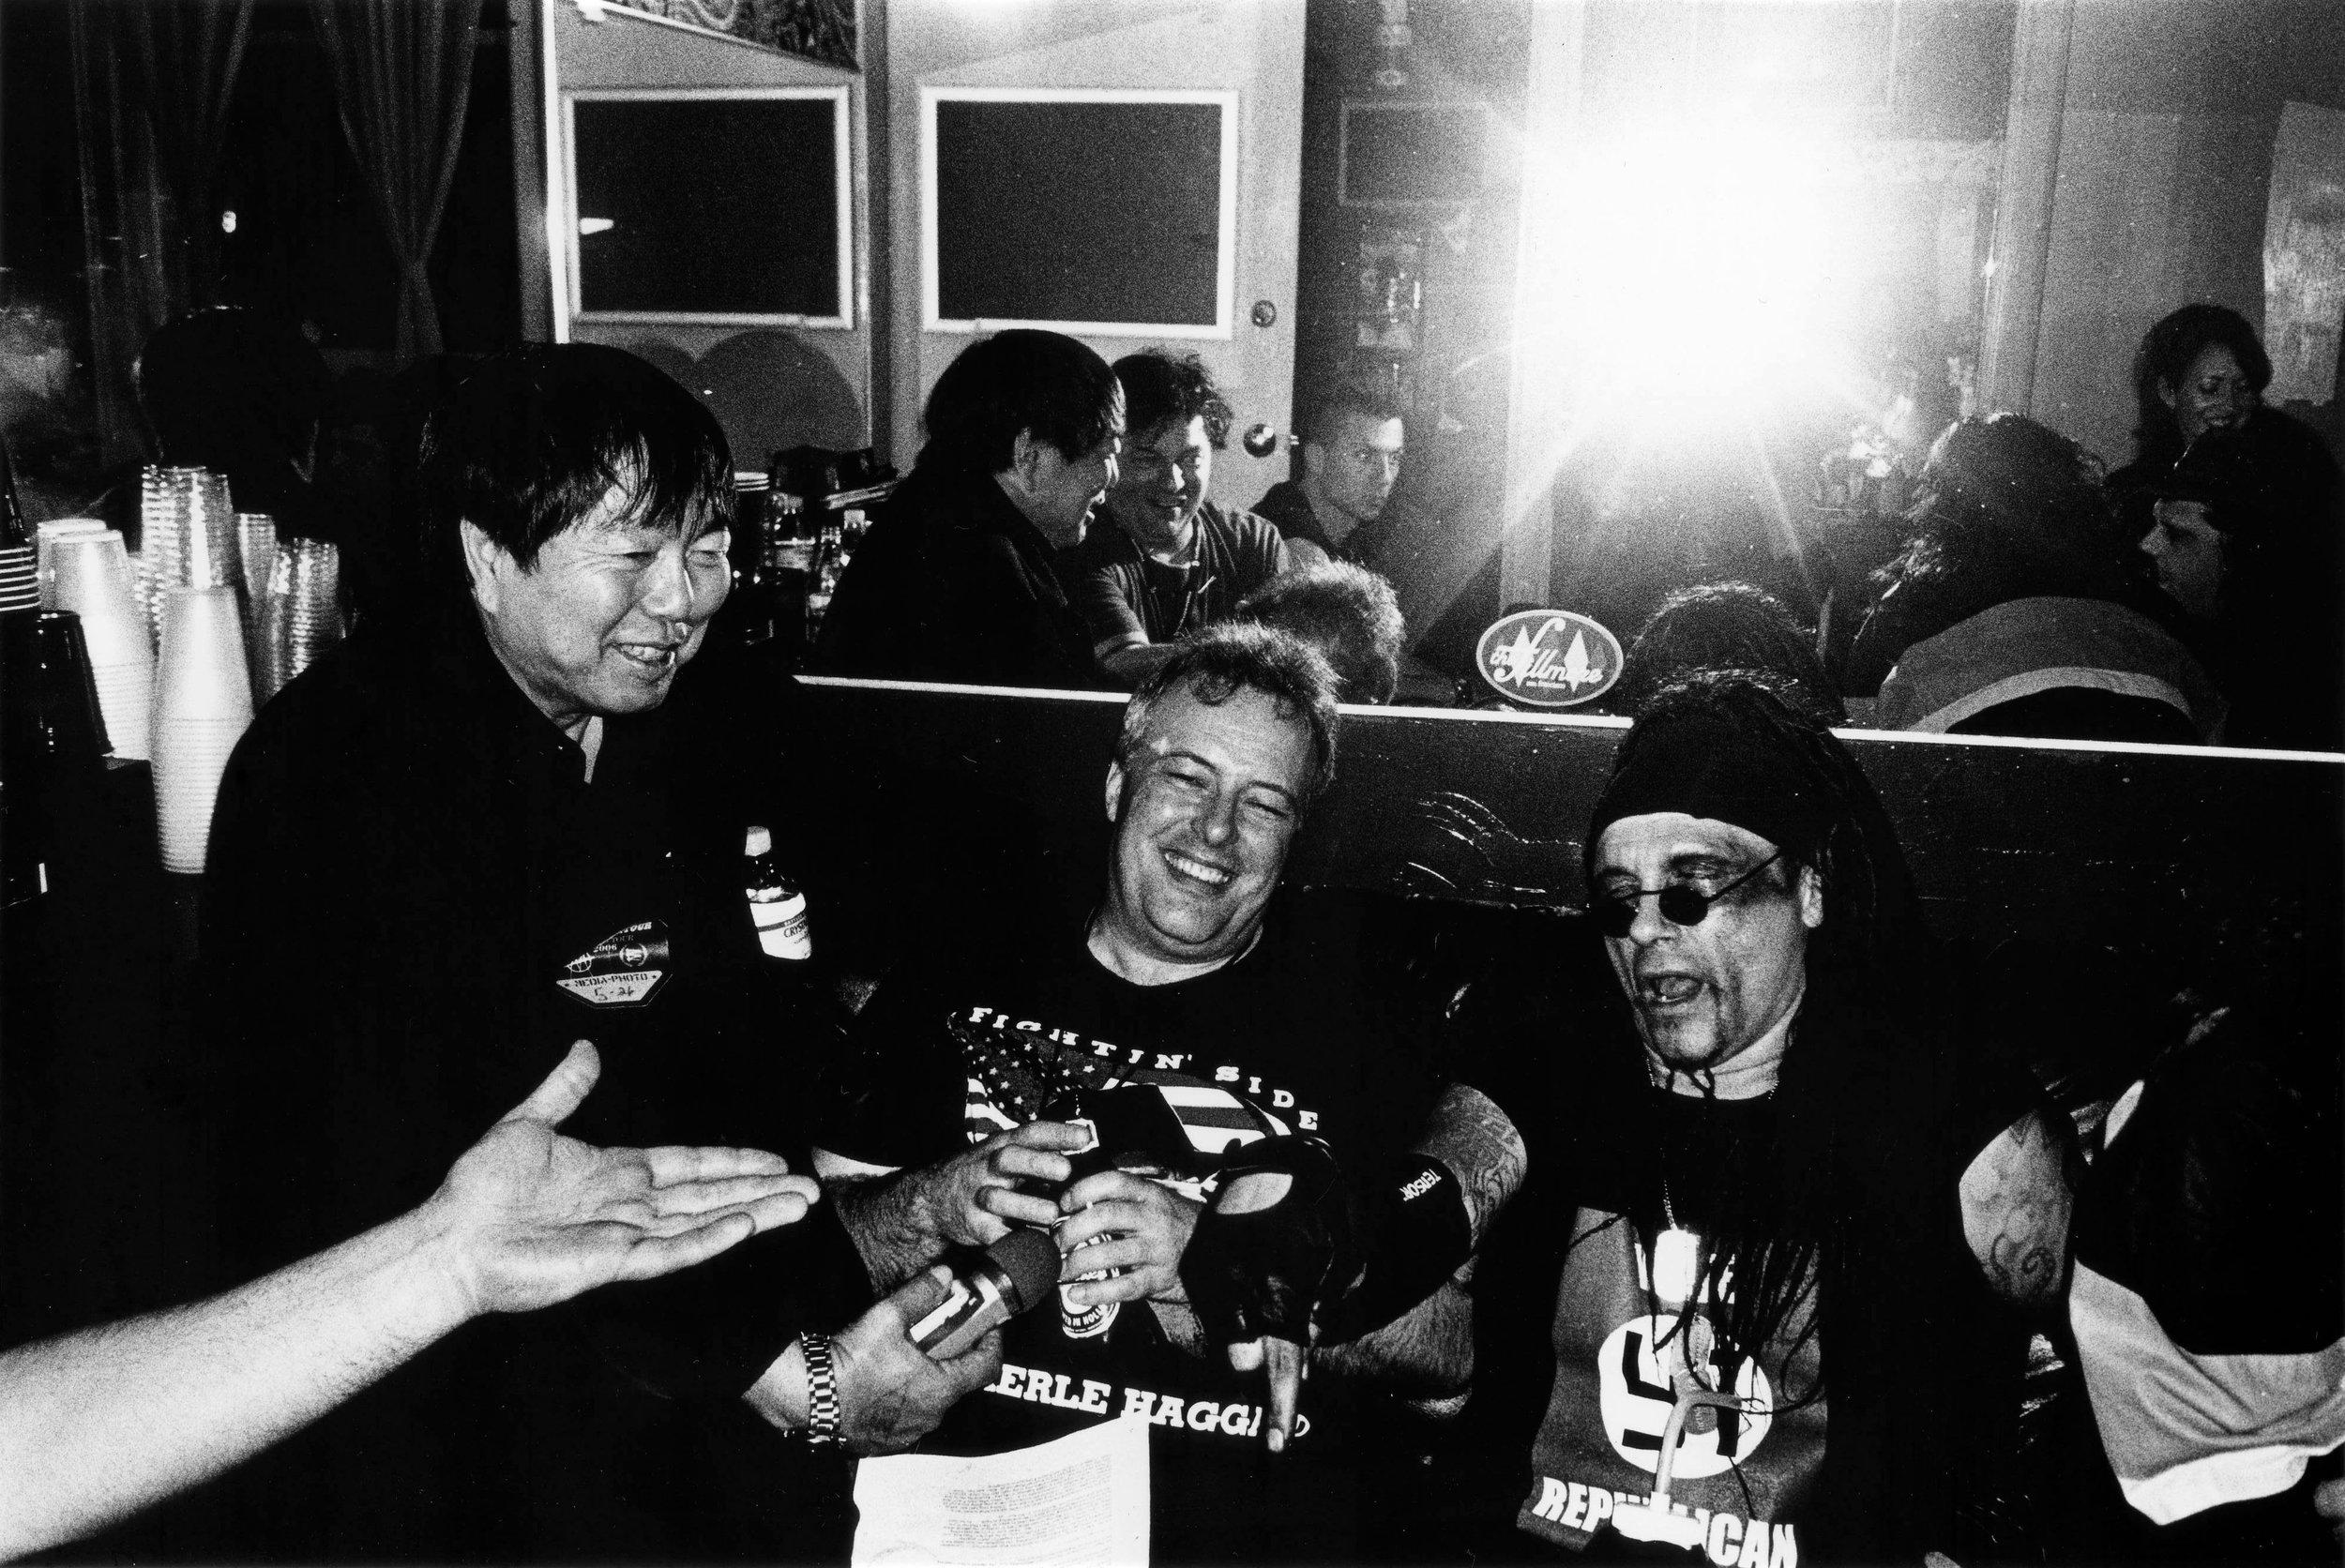 Photo of V. Vale, Jello Biafra, and Al Jorgensen by Yoshi Yubai.